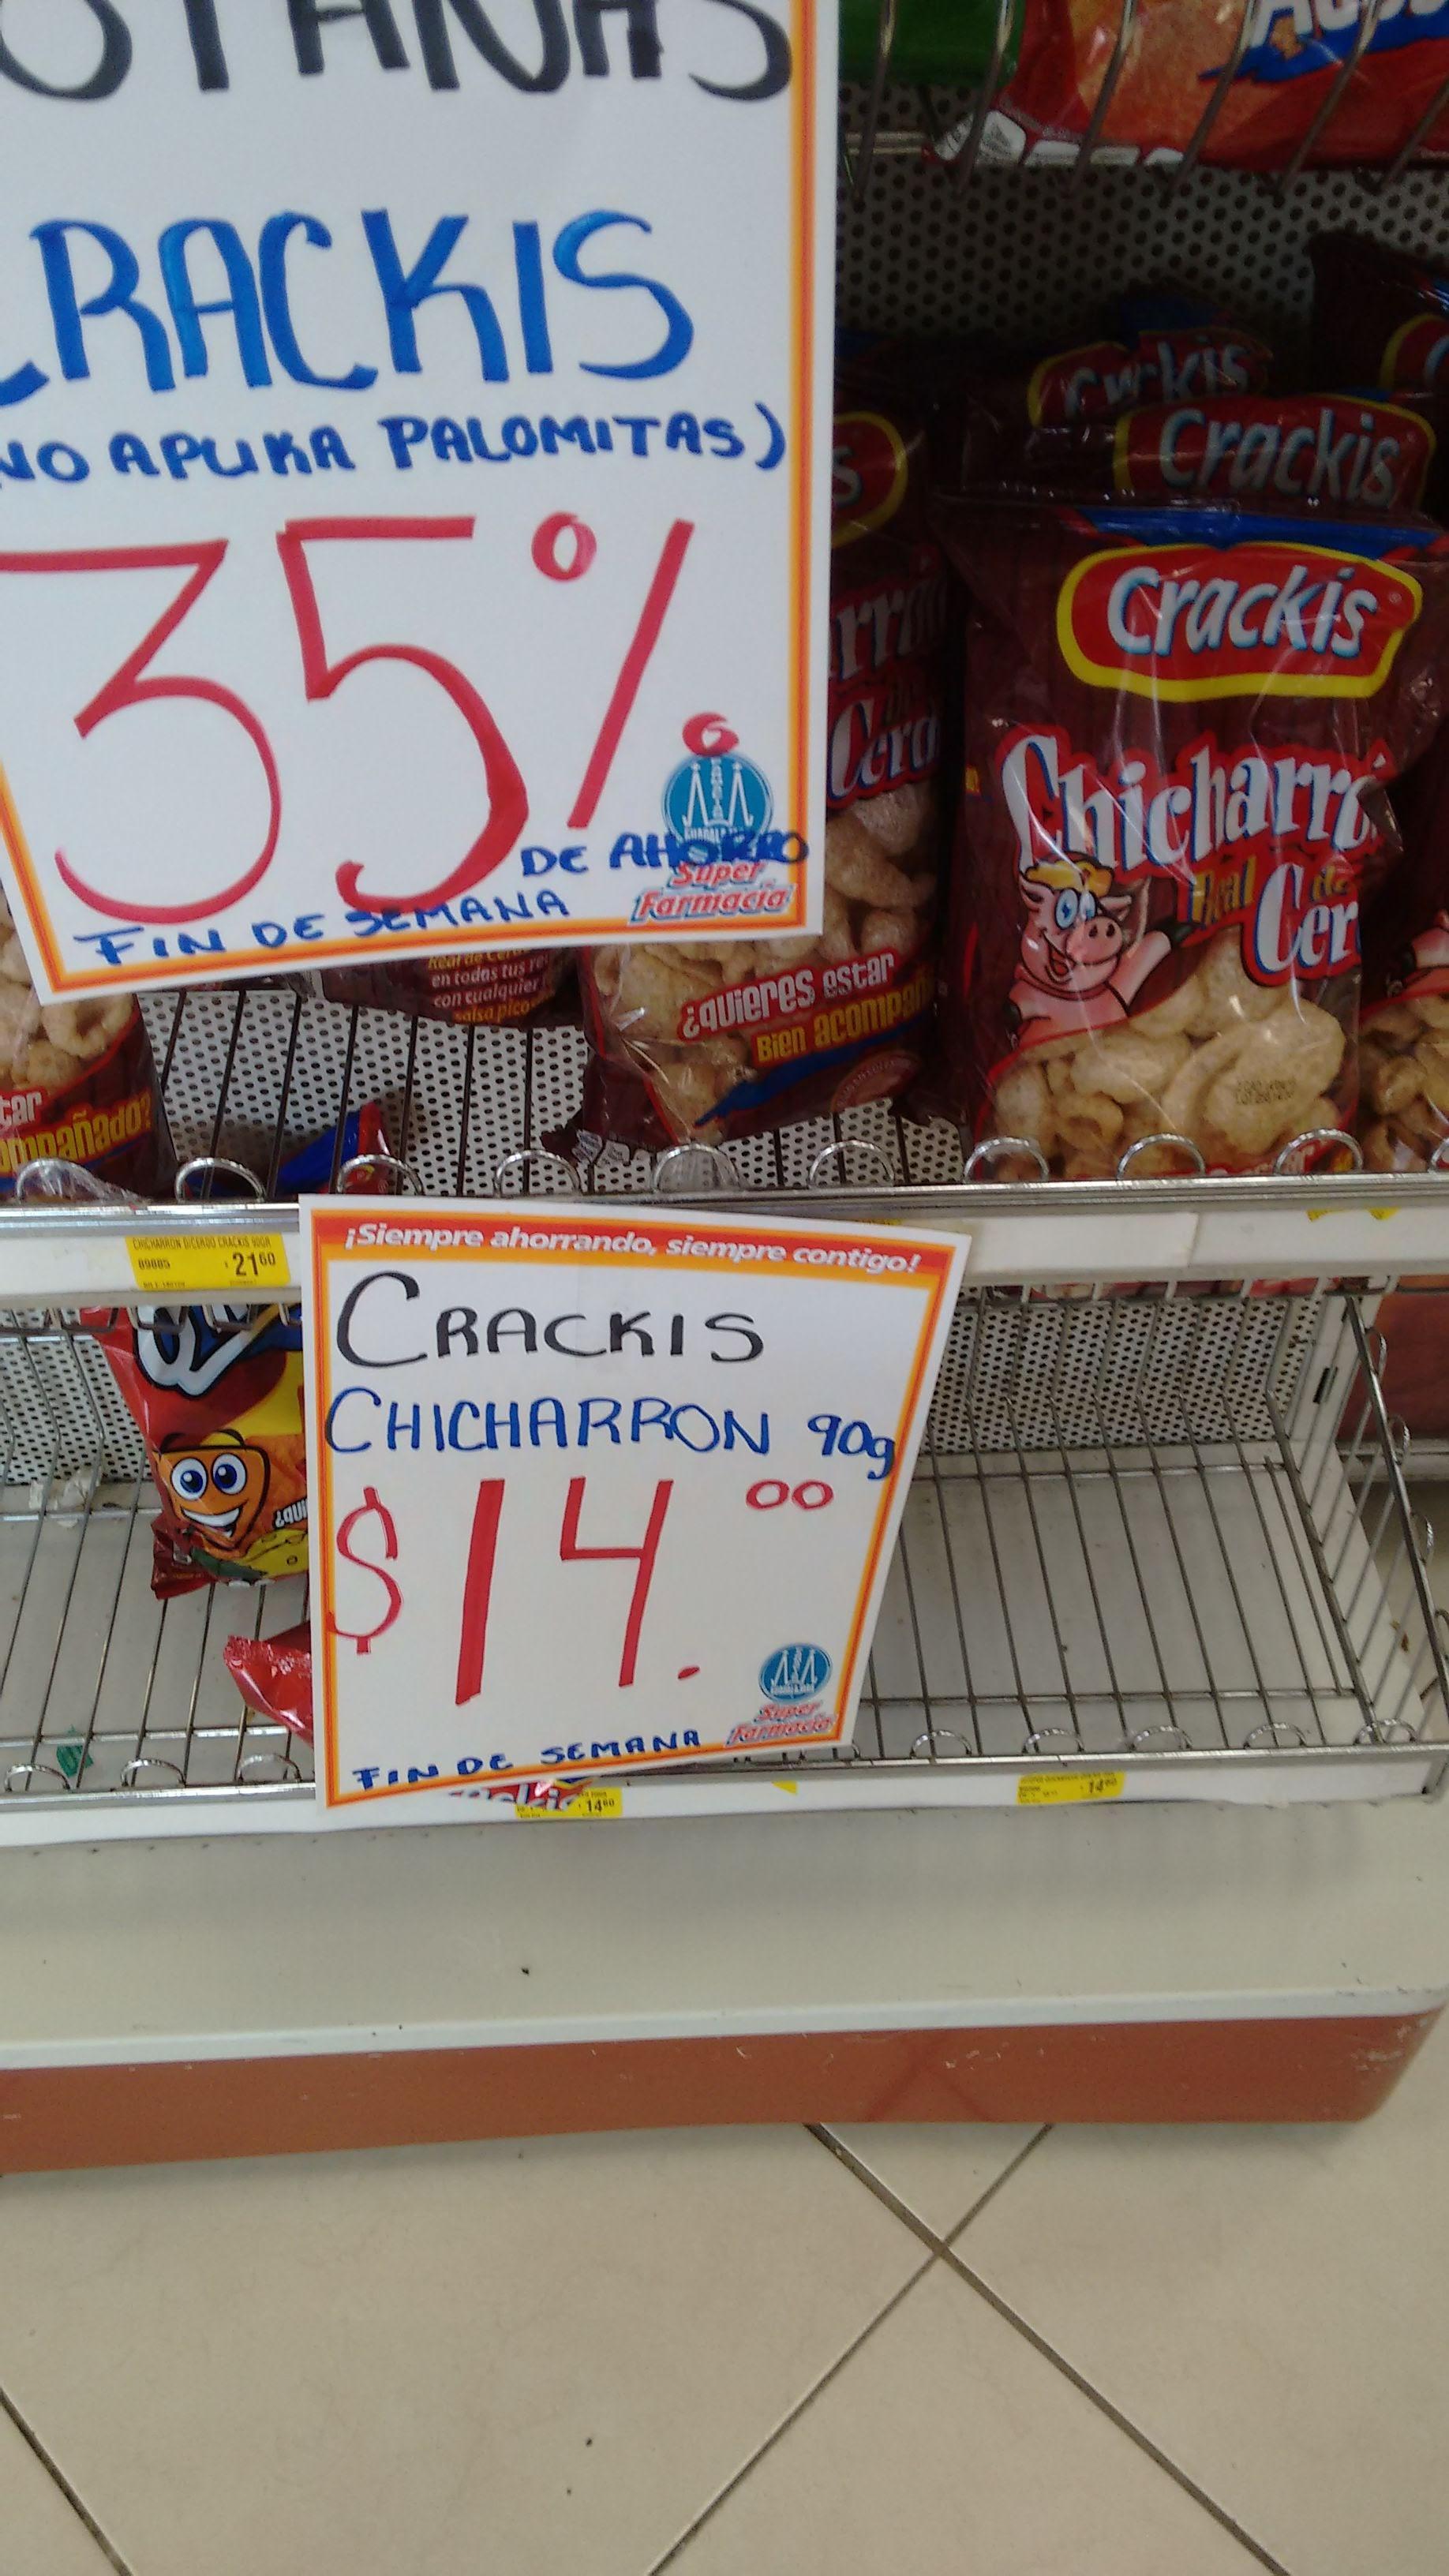 Farmacias Guadalajara - Chicharrón de cerdo Crackis de 90g por $14 pesos (bolsa grande)